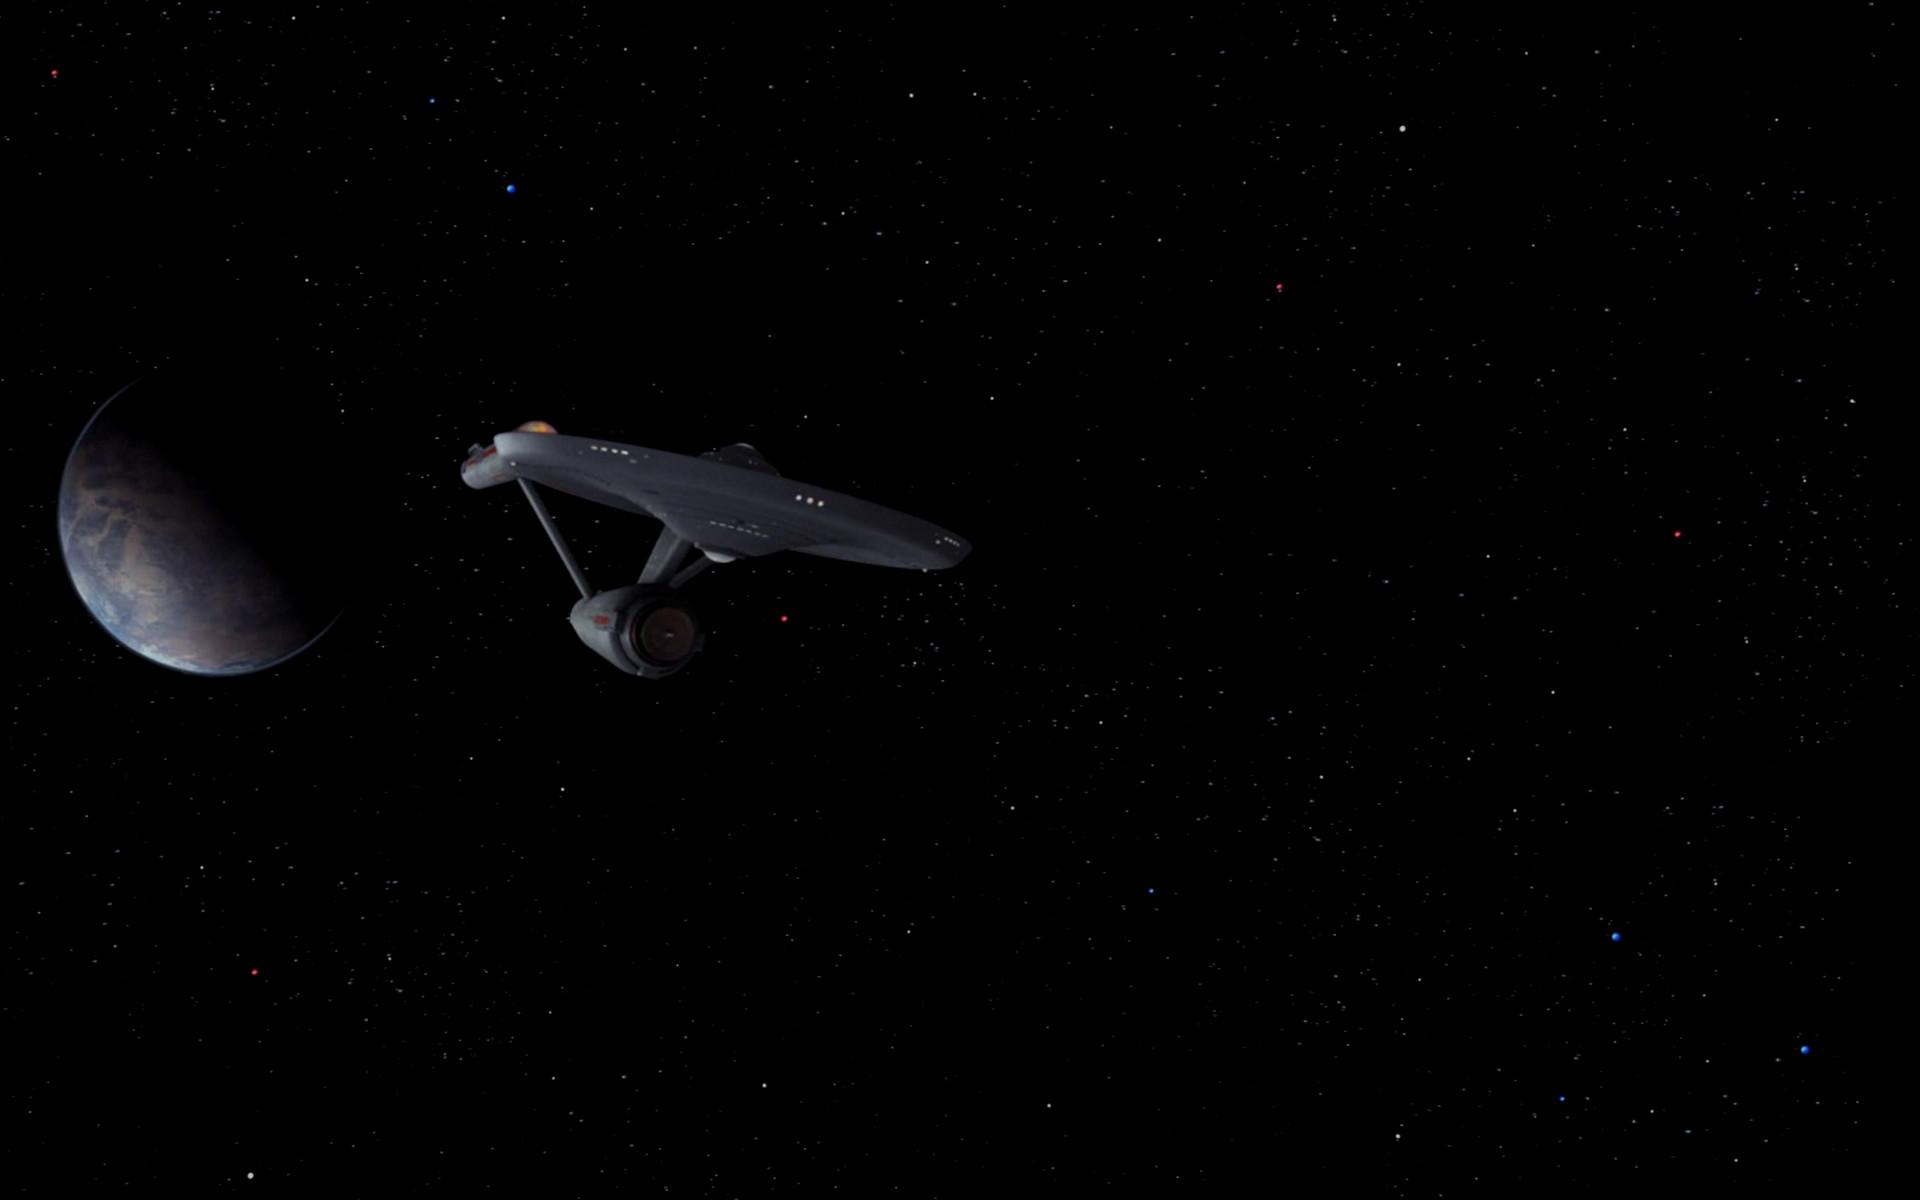 Kethinov – Star Trek Original Series Wallpapers